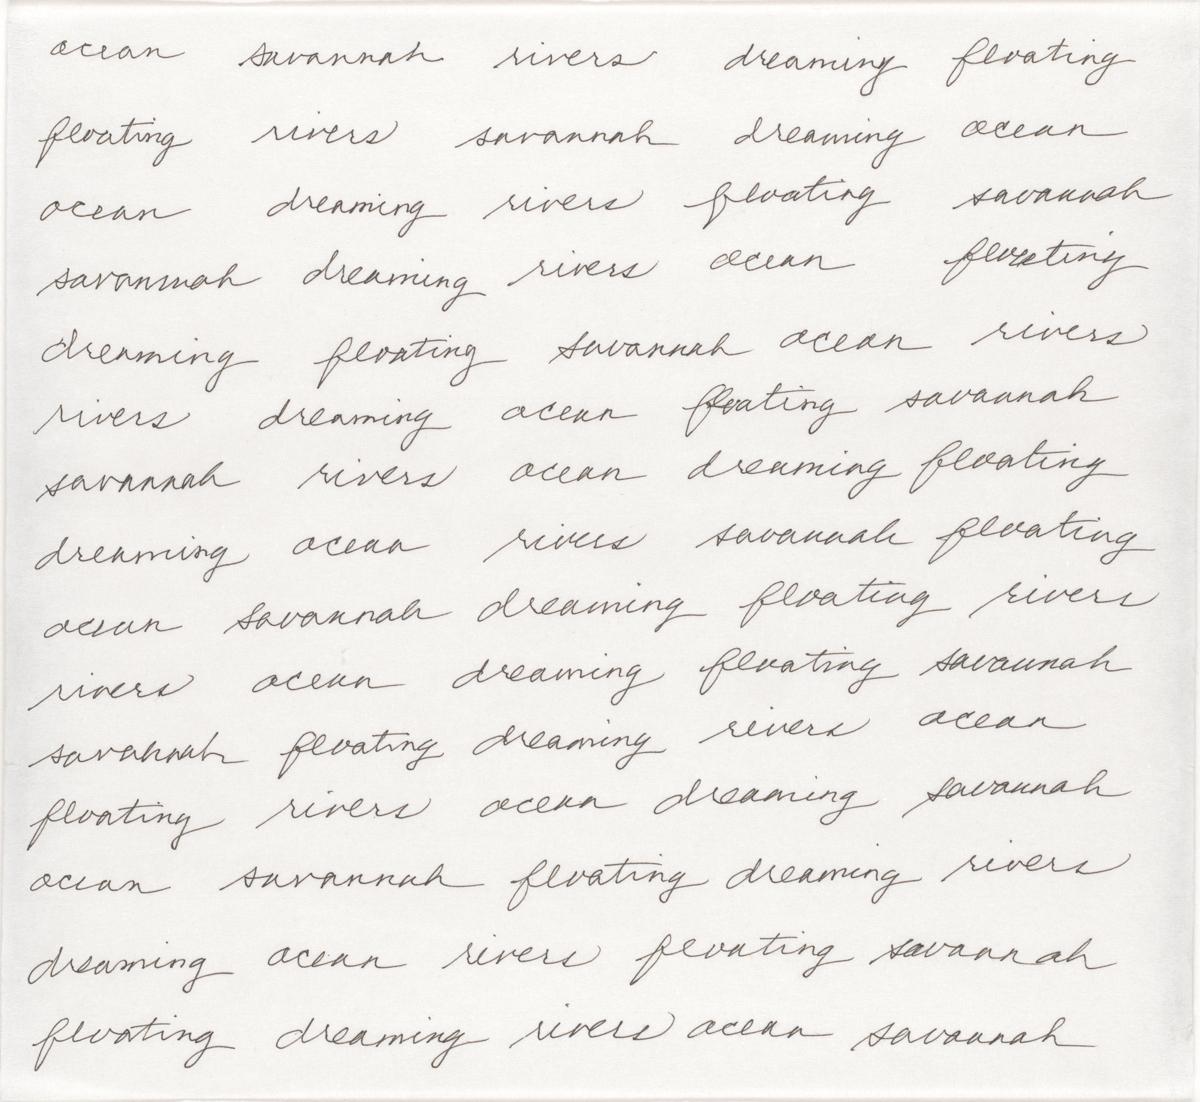 Maren Hassinger, Ocean Savannah Rivers Dreaming Floating, 2007. Tinta sobre papel. Enmarcado: 14 ¼ x 13 ¼ x 1 ¼ pulgadas.